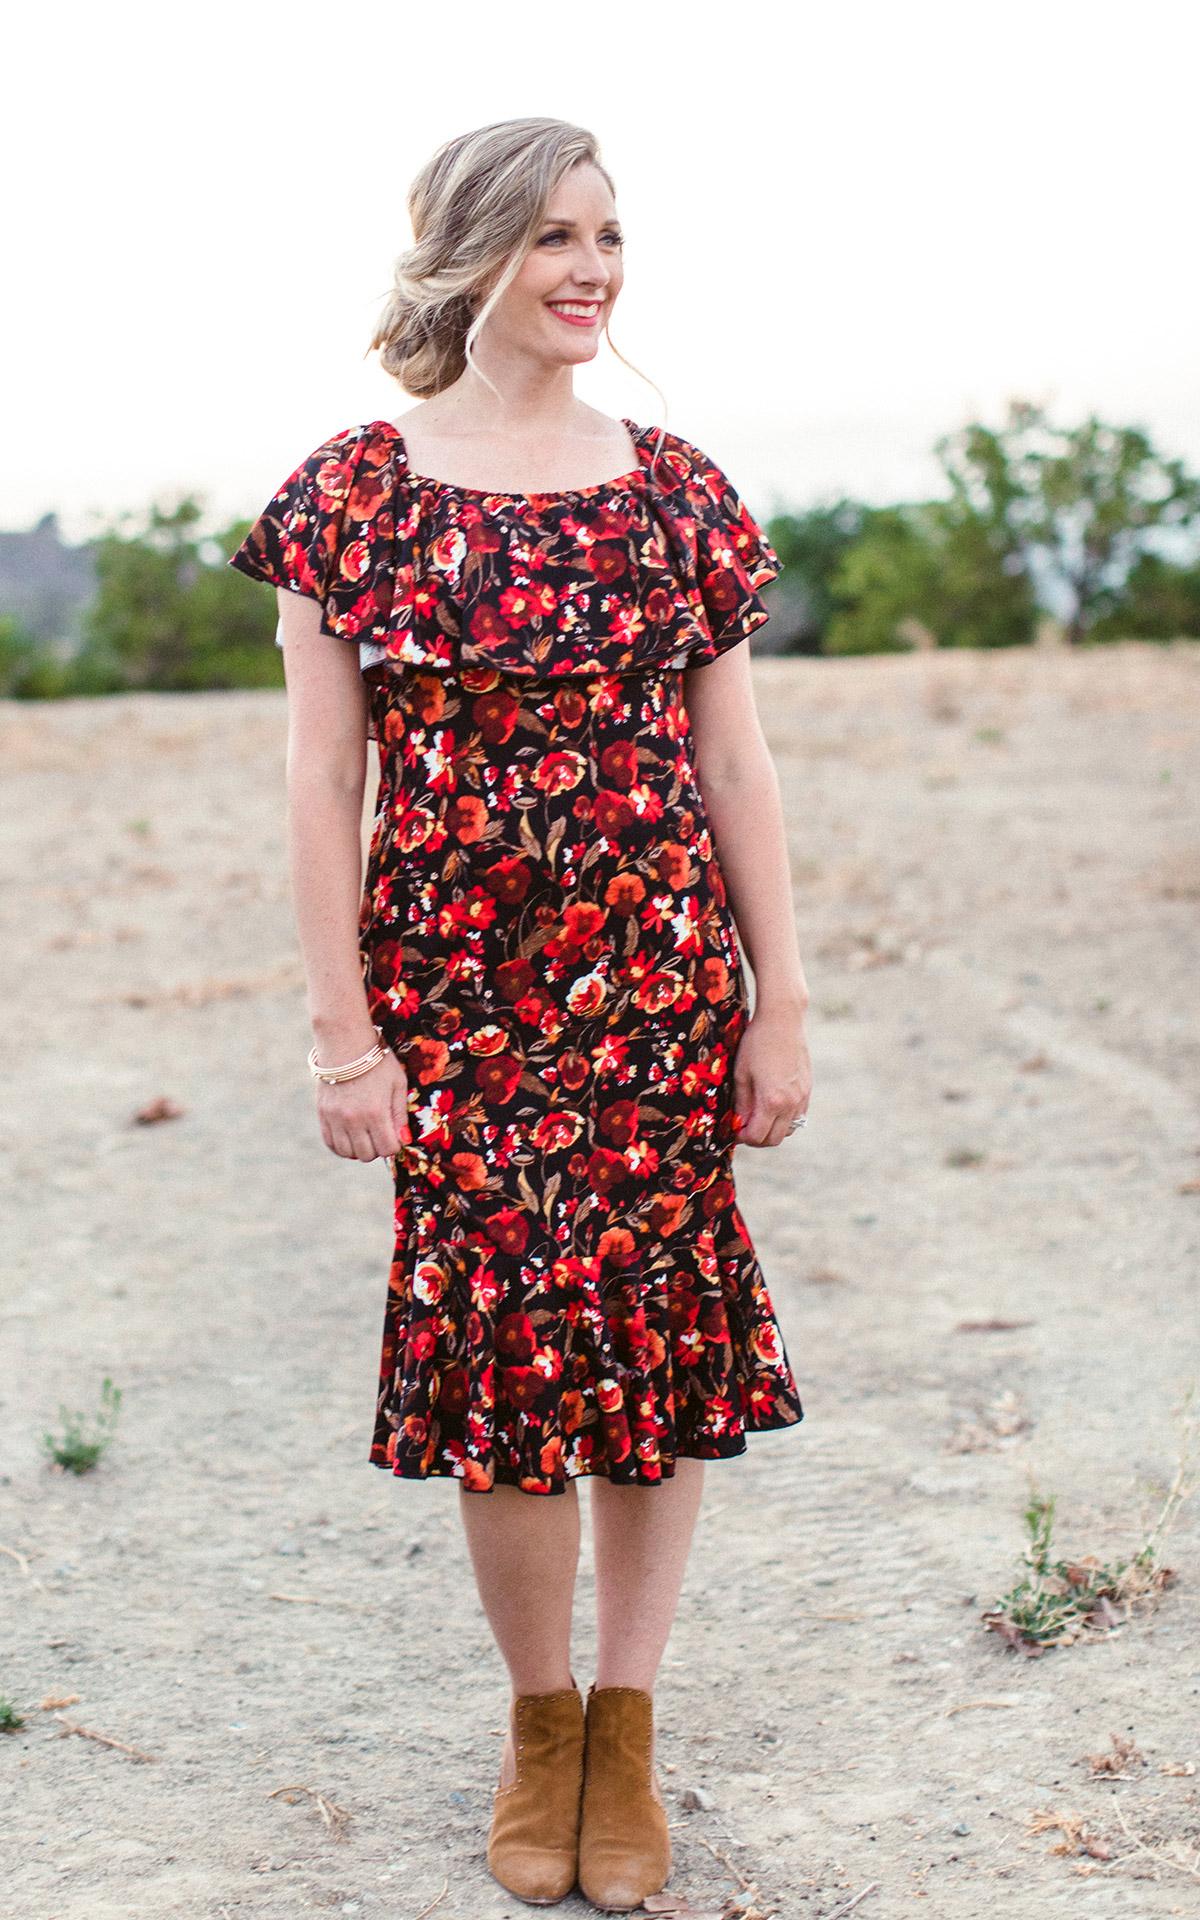 LuLaRoe-Cici-Flounce-tropical-dress-red-floral.jpg